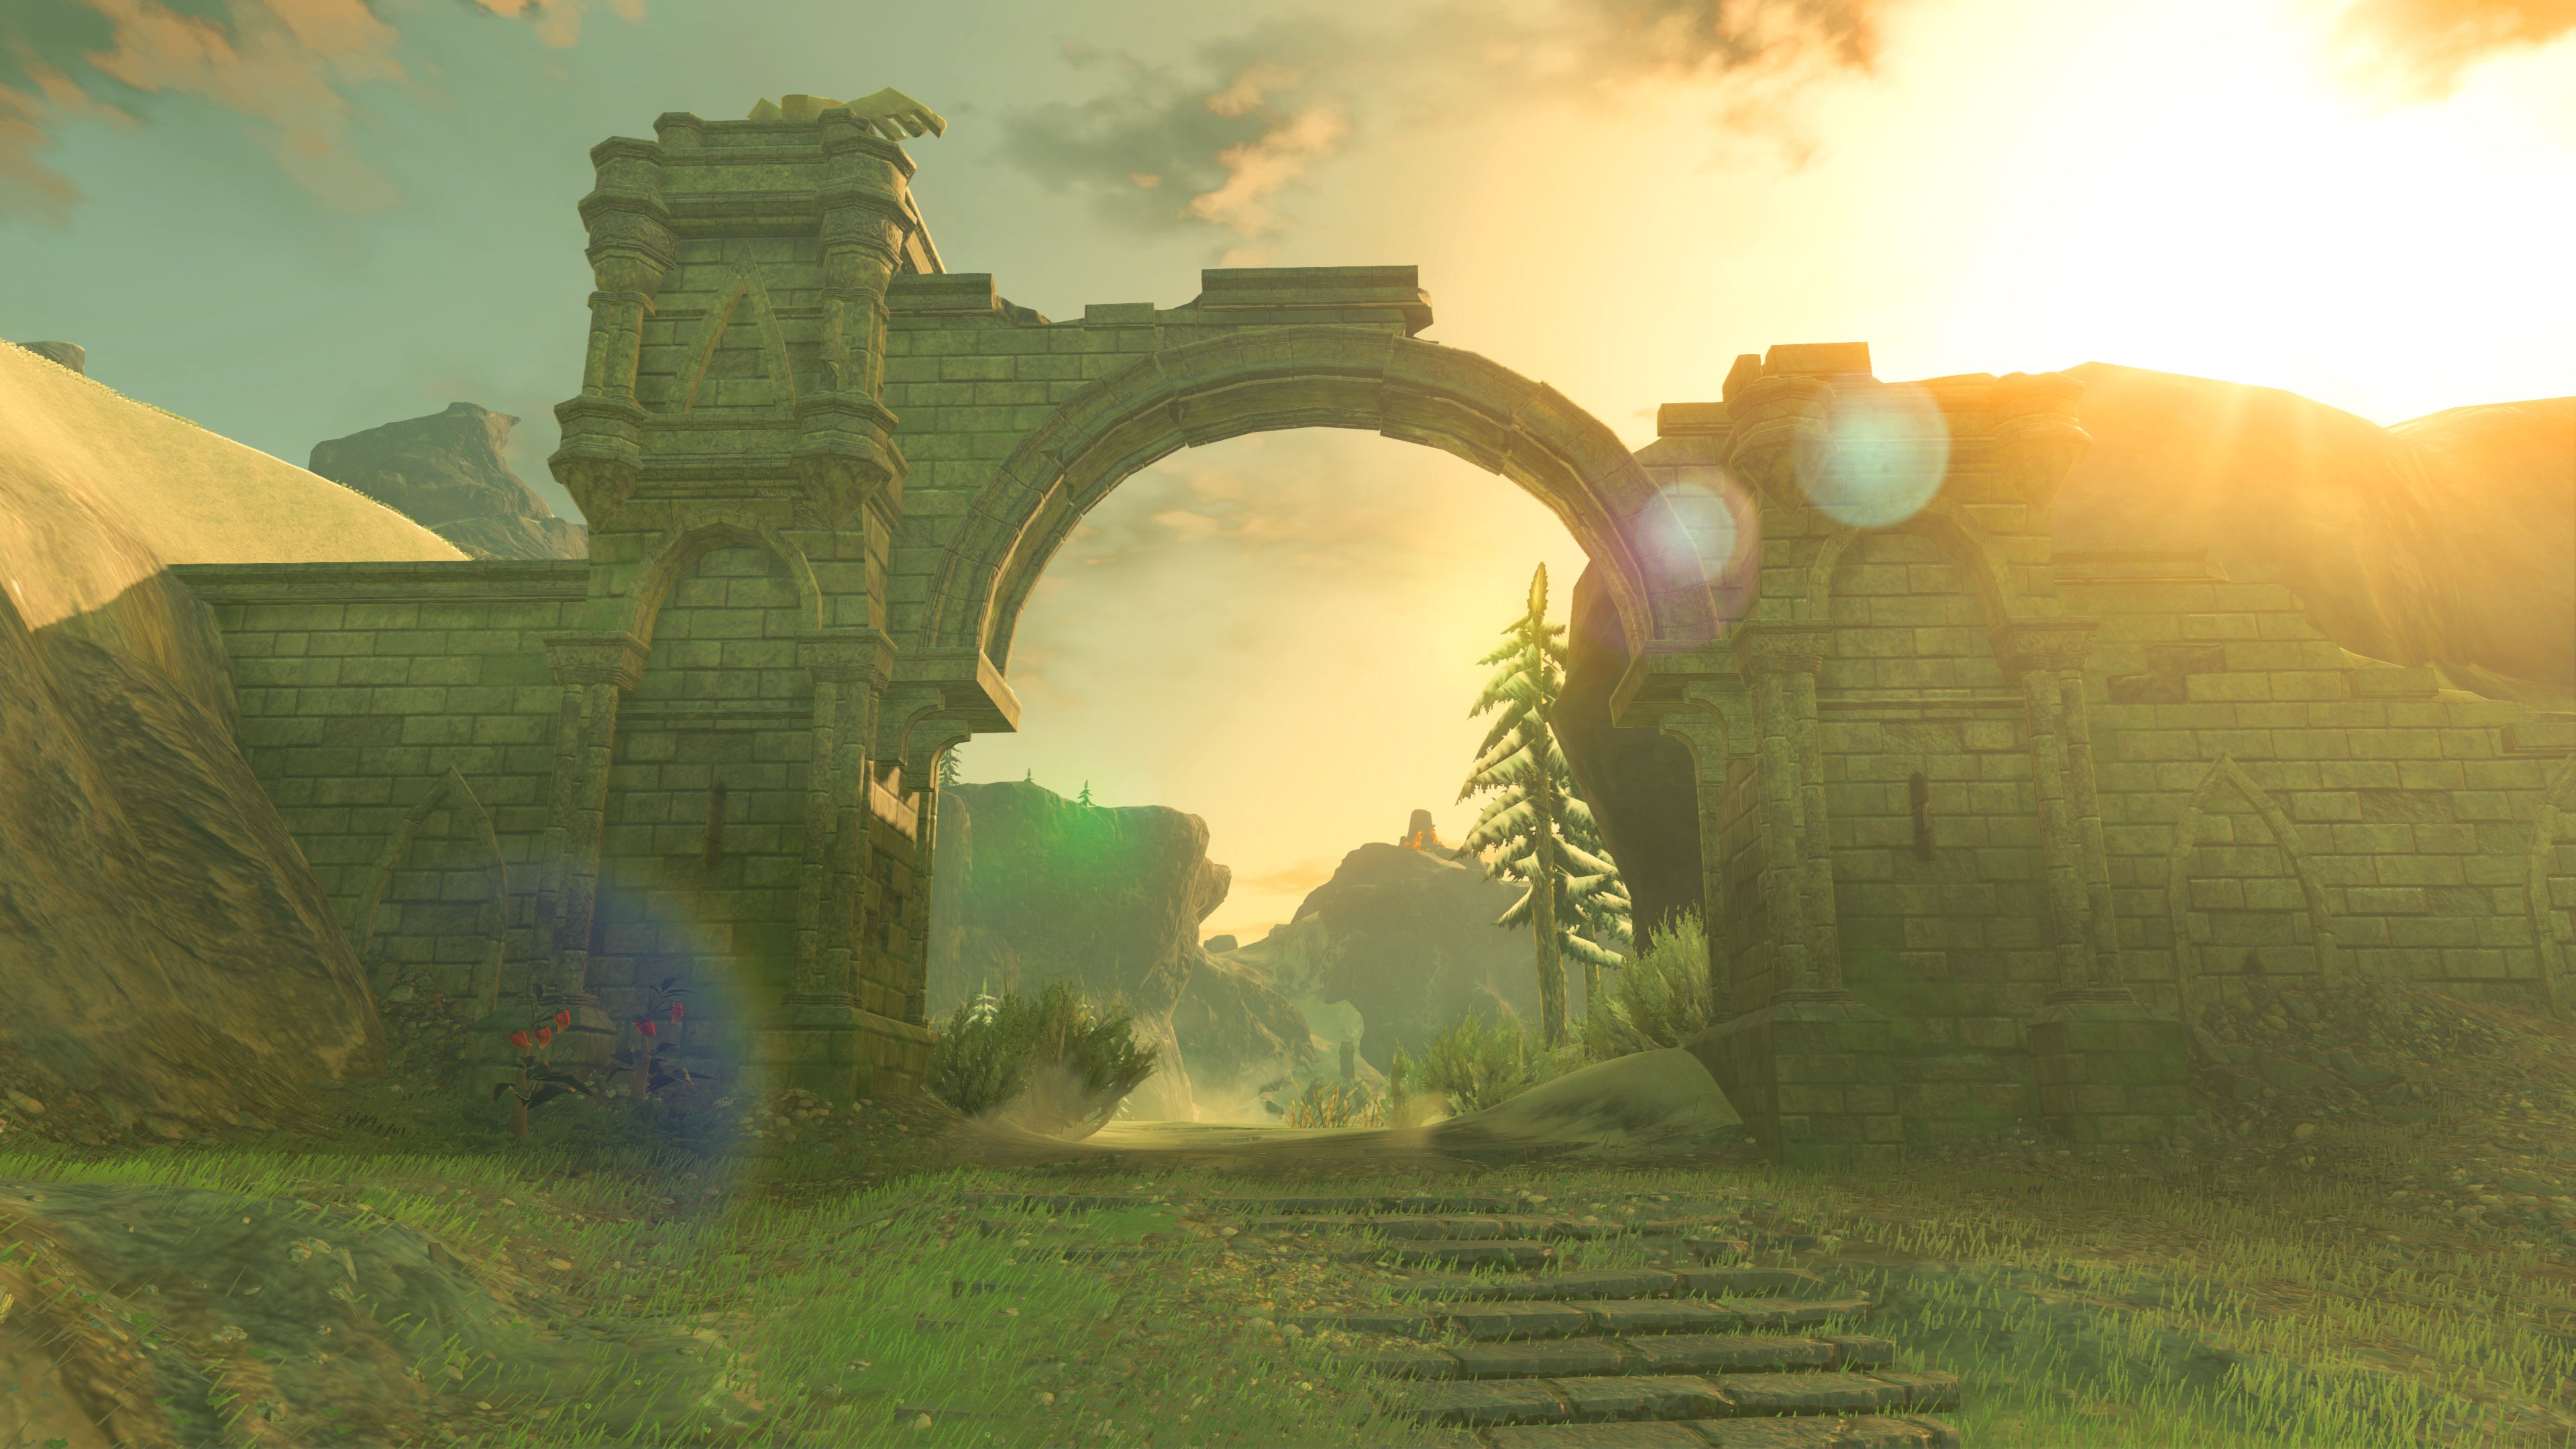 The Legend of Zelda Breath of the Wild Wallpaper Pack